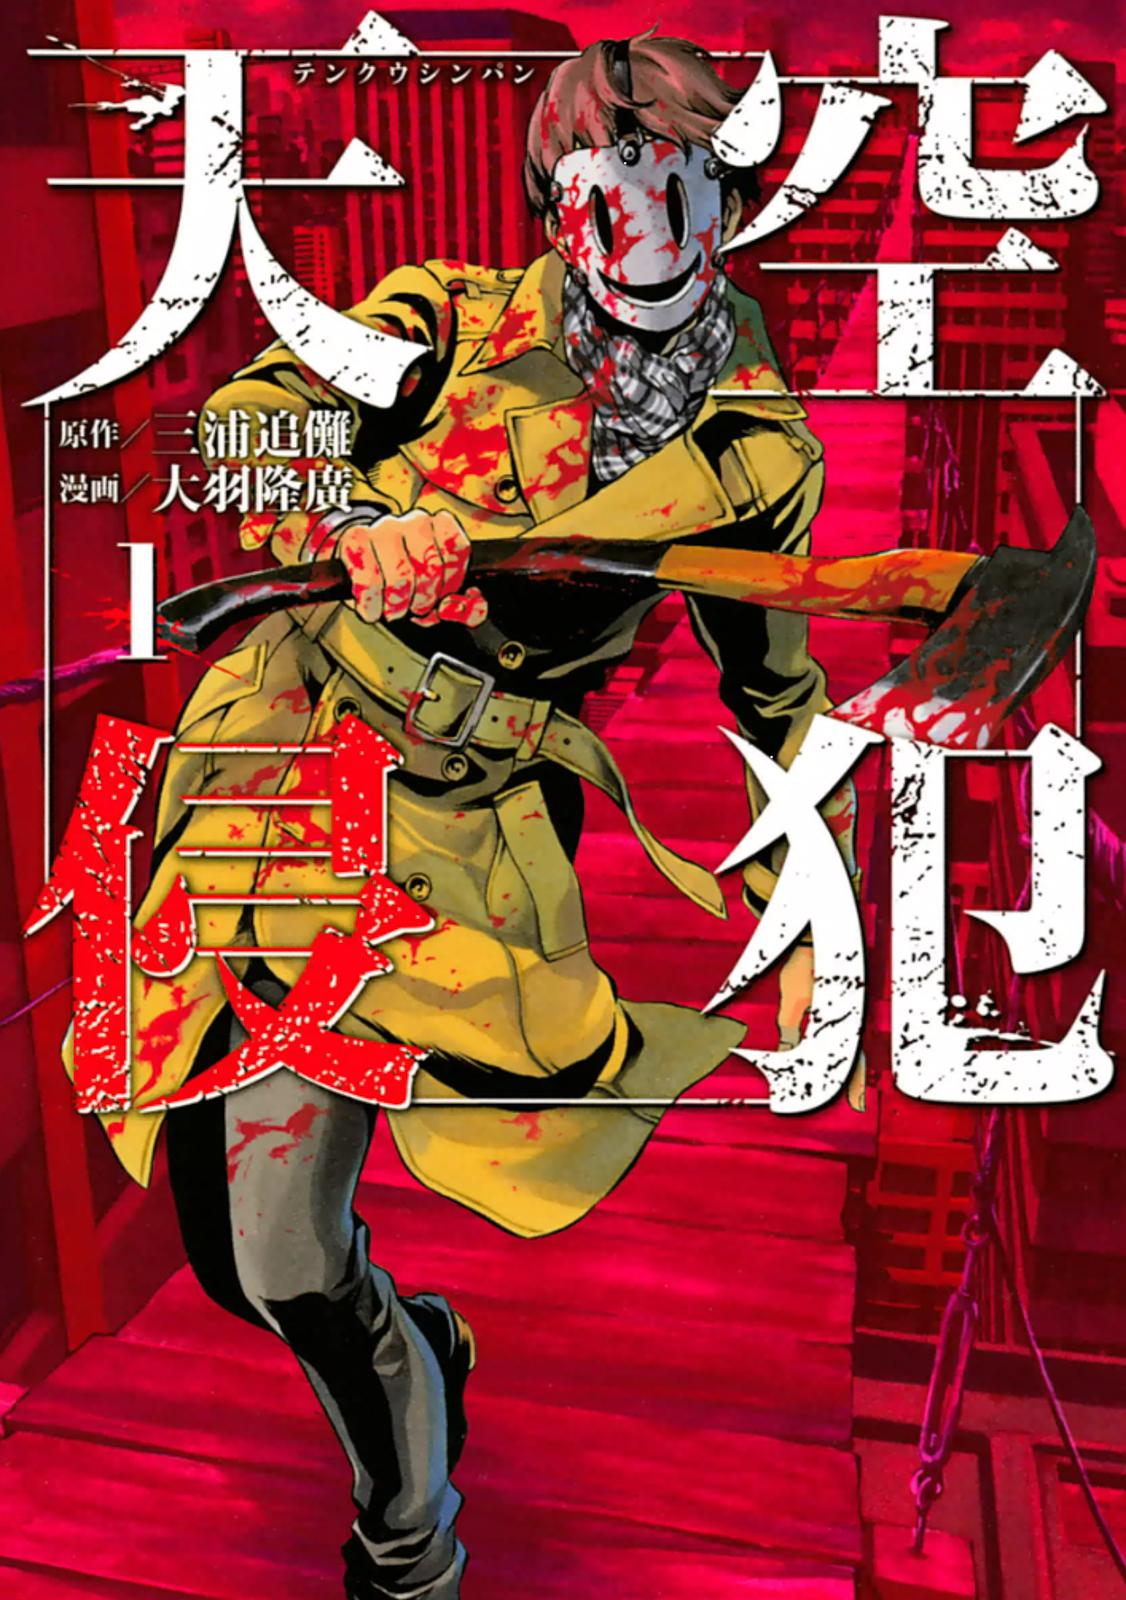 Tenkuu Shinpan será publicado pela editora Panini